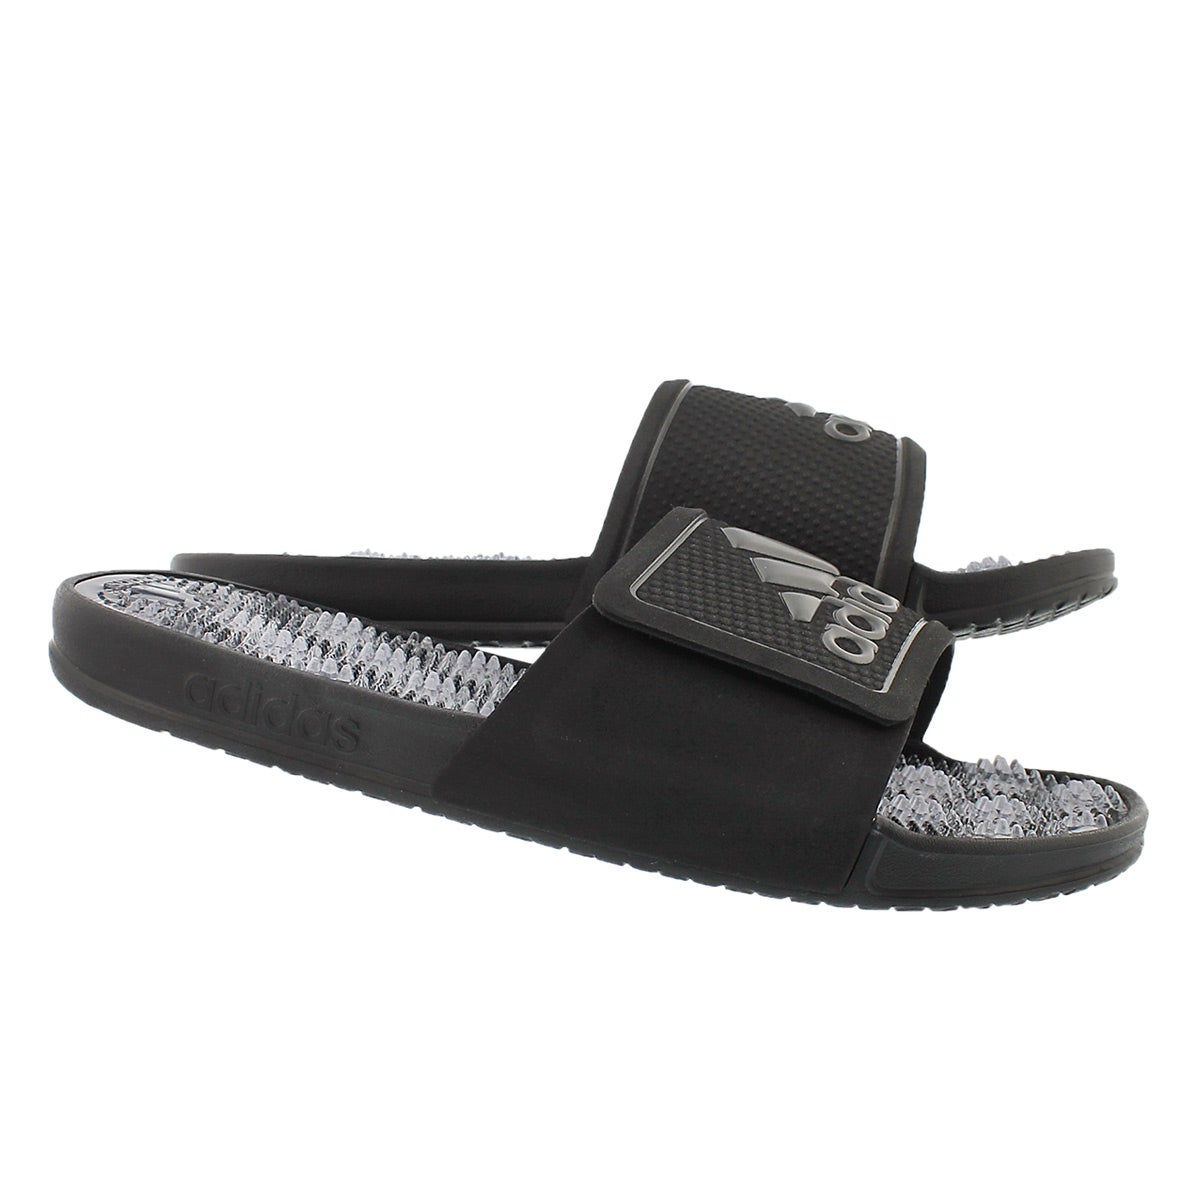 Mns Adissage 2.0 blk/wht slide sandal